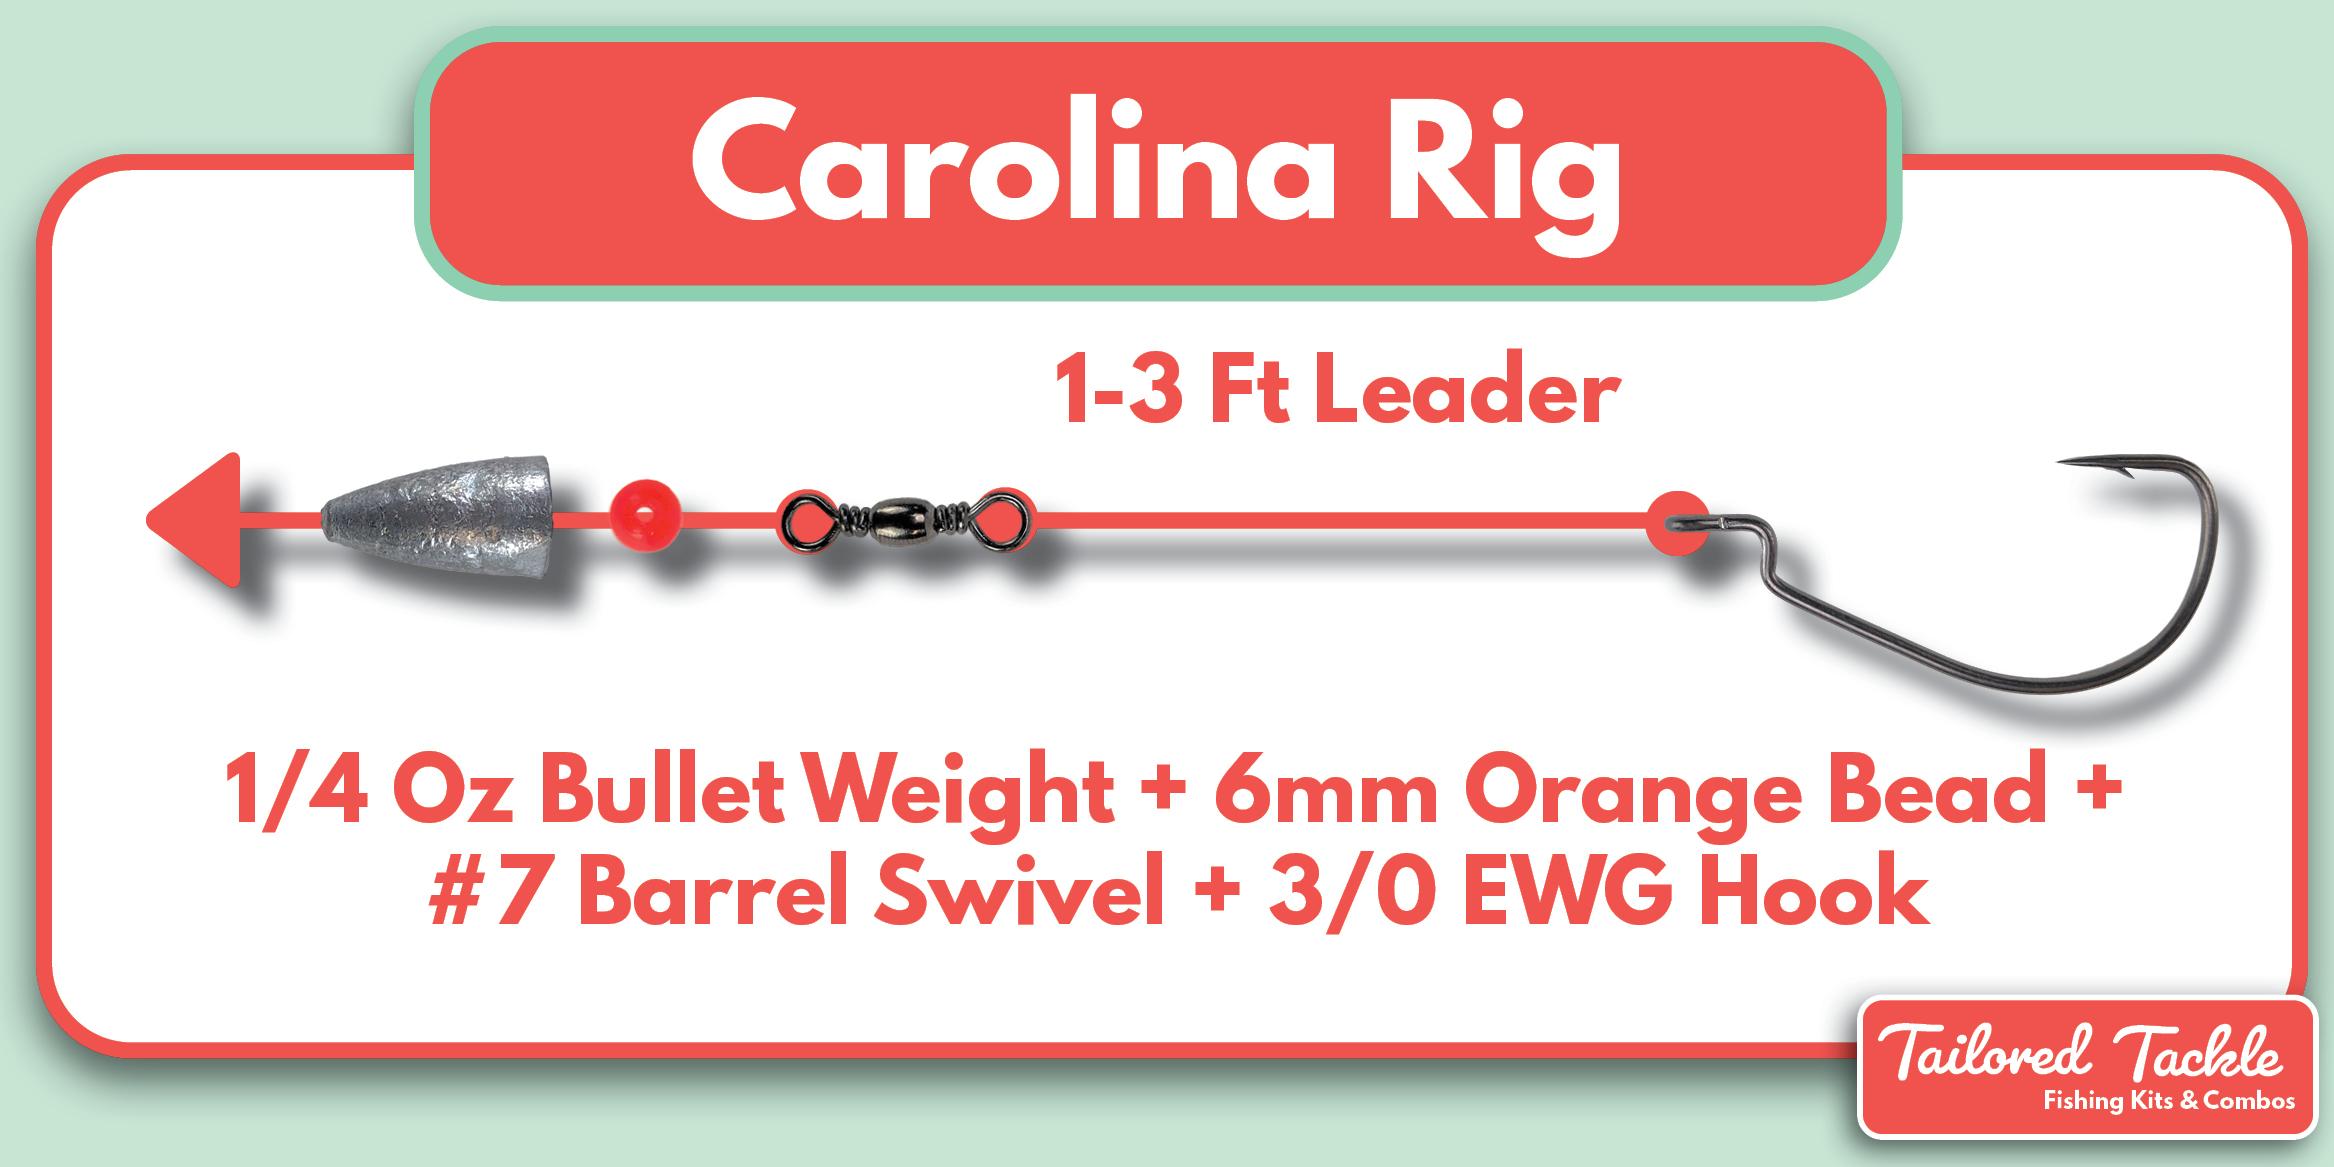 Carolina Rig Fishing Setup How to Make a Carolina Rig Tailored Tackle